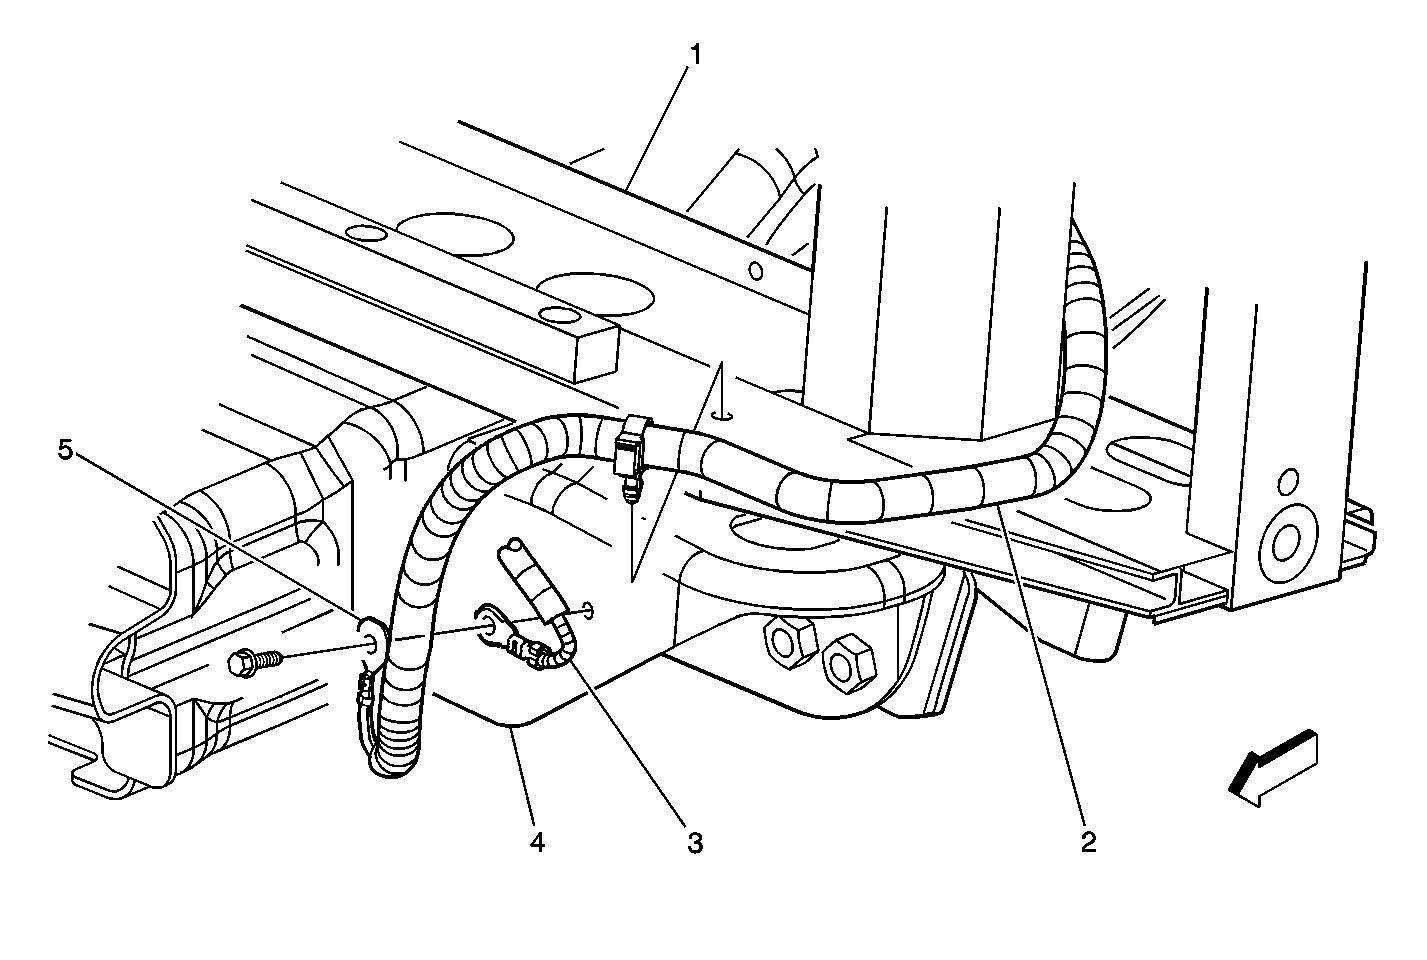 roger vivi ersaks: 2005 Chevy Silverado Blower Motor